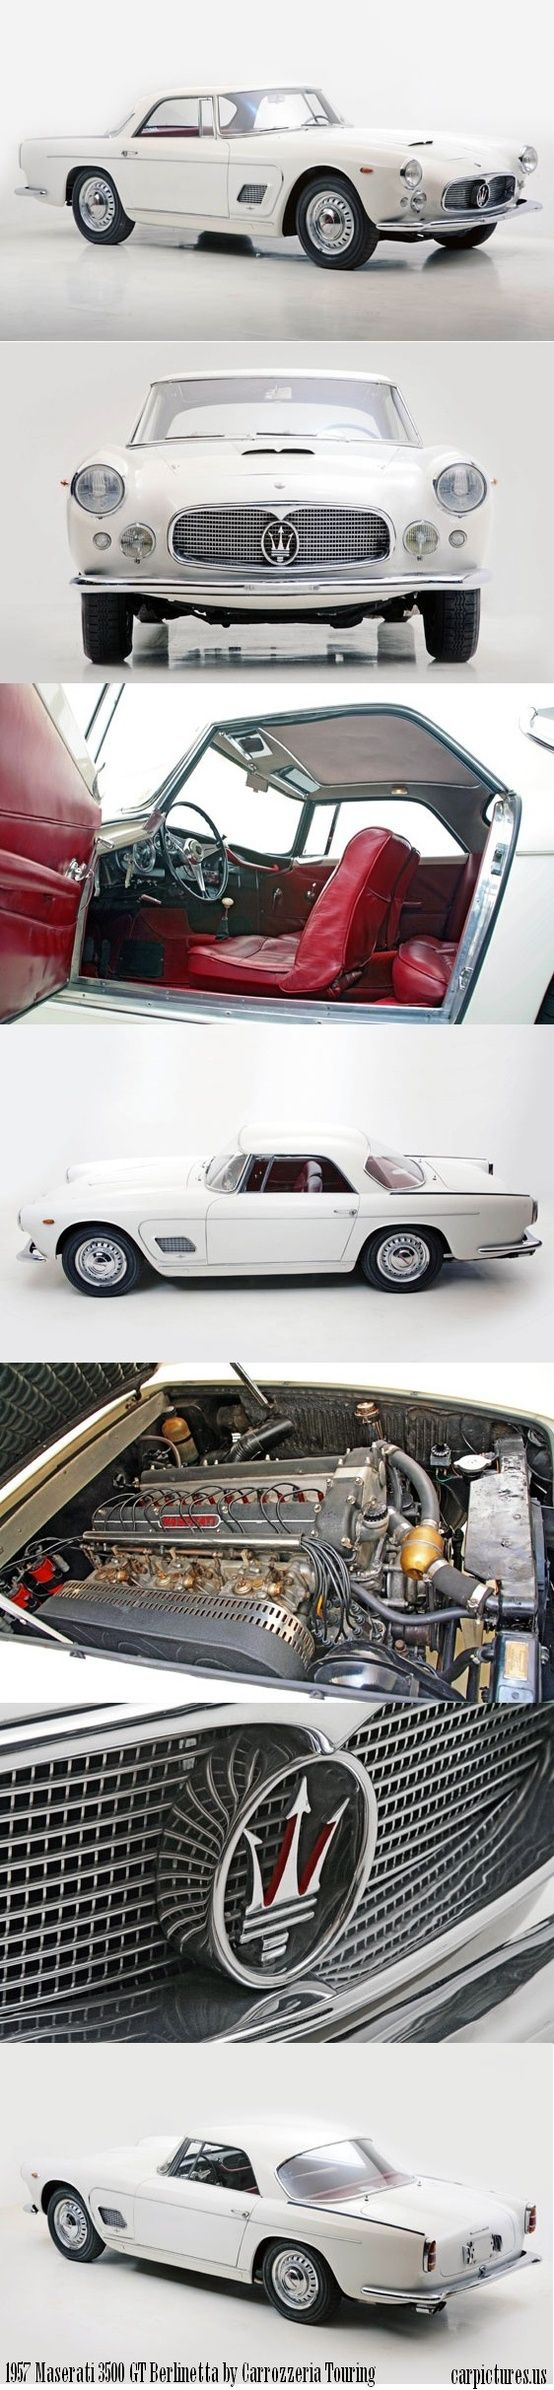 1957 Maserati 3500 G: